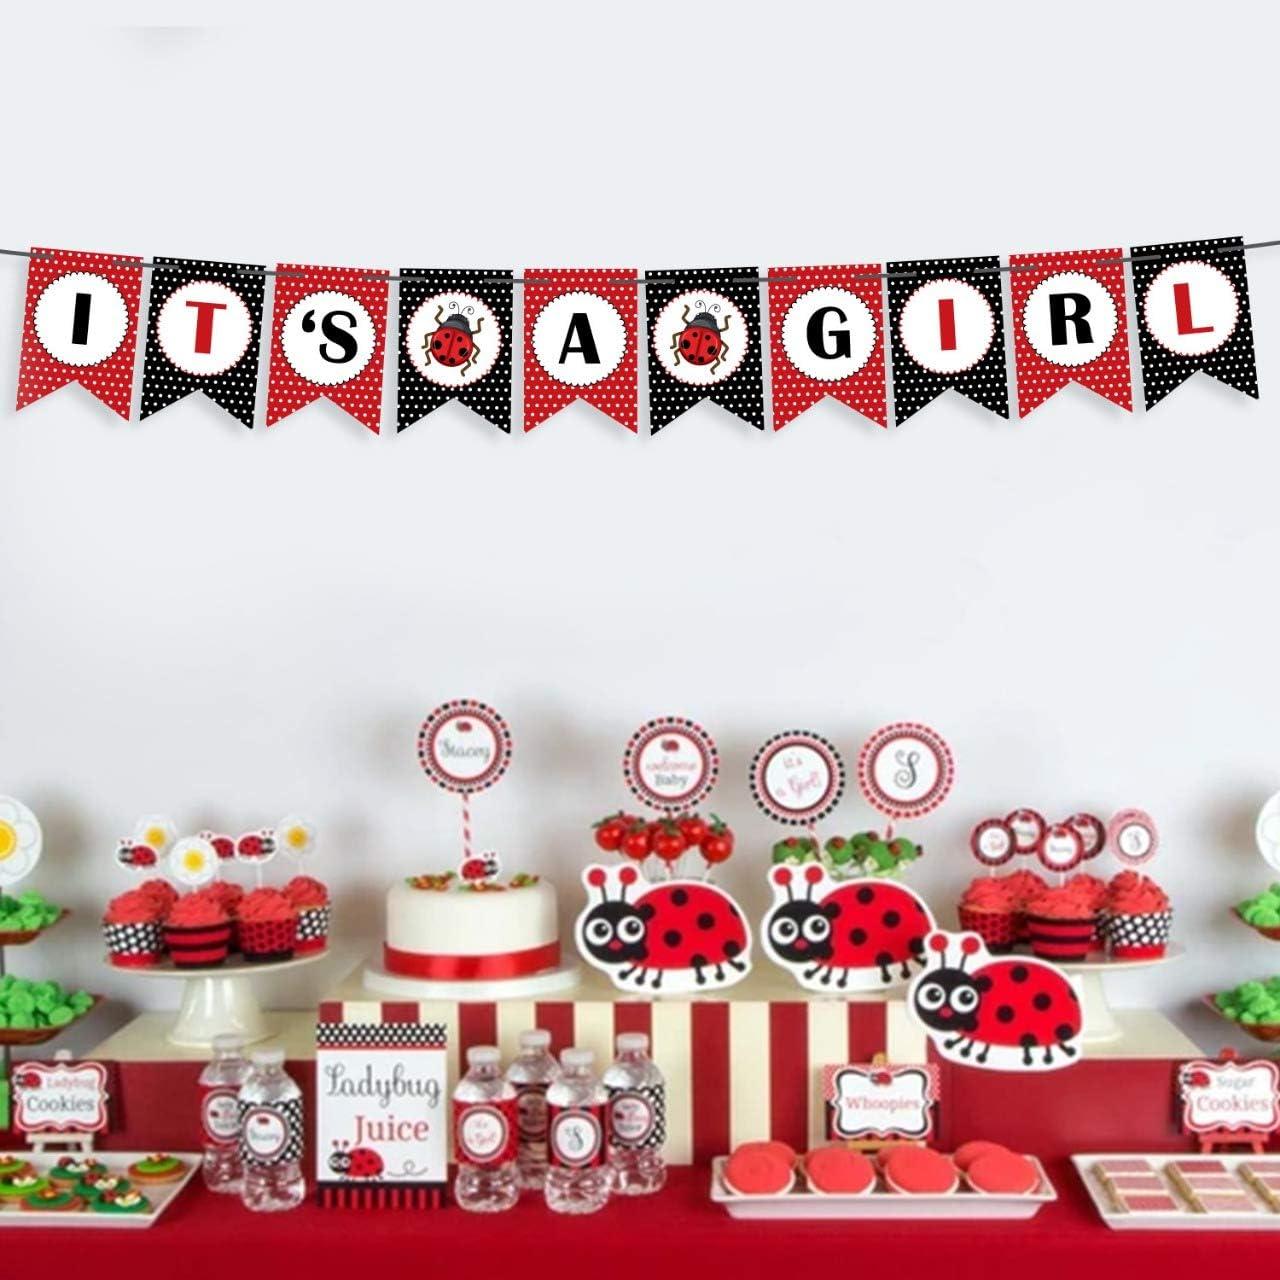 Ladybug First Birthday Party Ladybug Party Decorations Ladybug High Chair Banner Ladybug Banner 1st Birthday Banner Ladybug Photo Prop